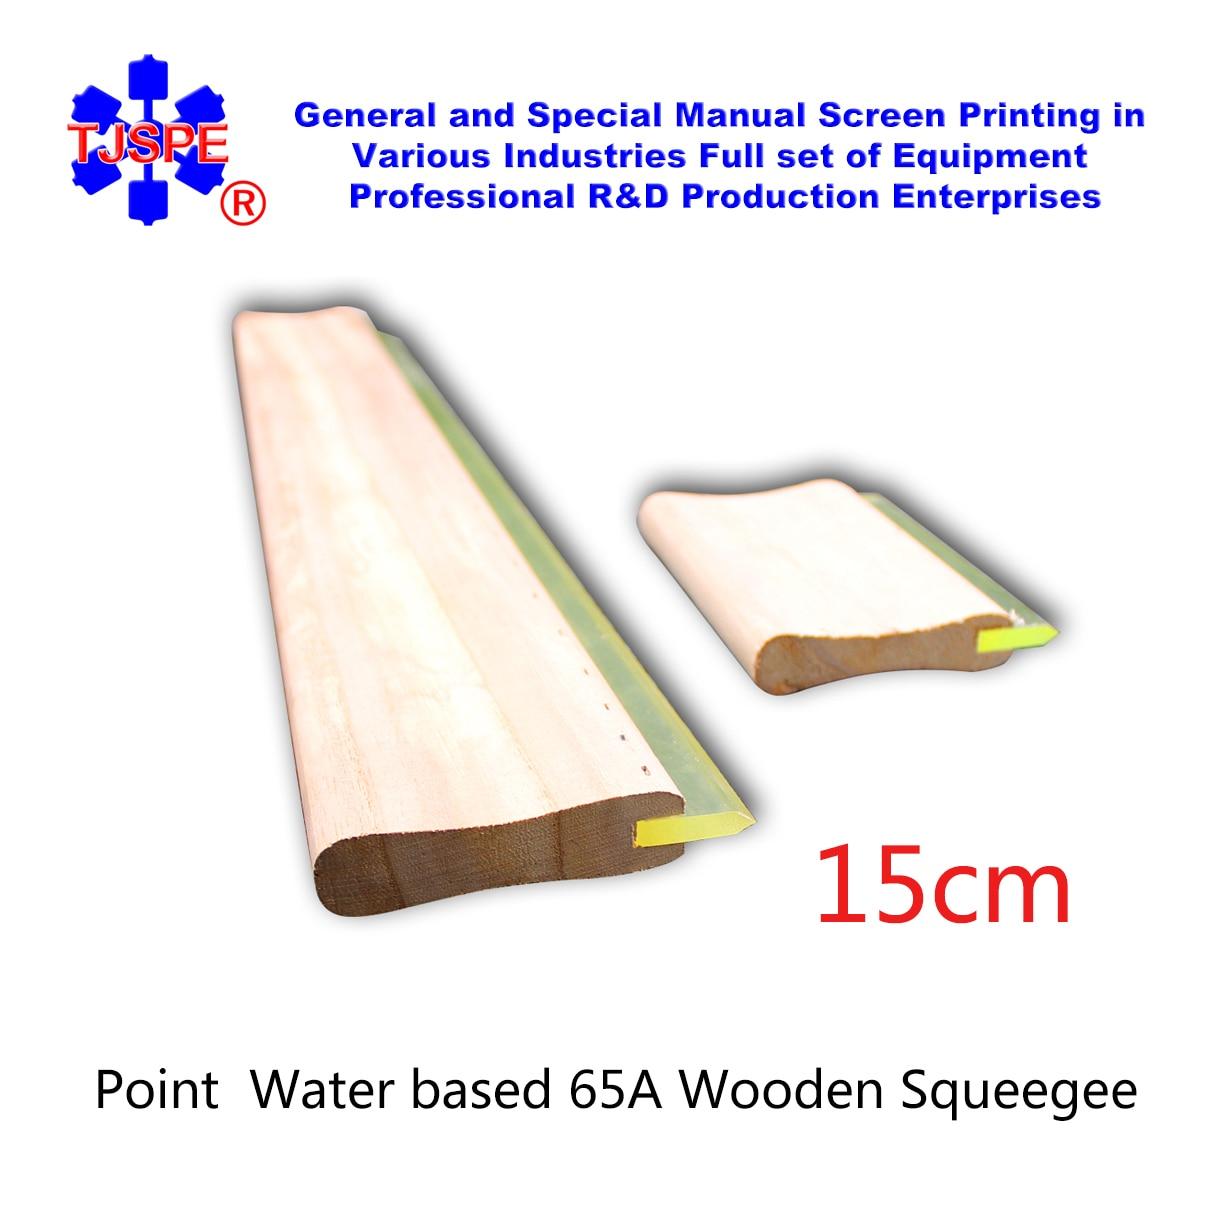 Point Screen Printing Squeegee Manual Screen Printing 15cm  65 Dero Water Based Squeegee